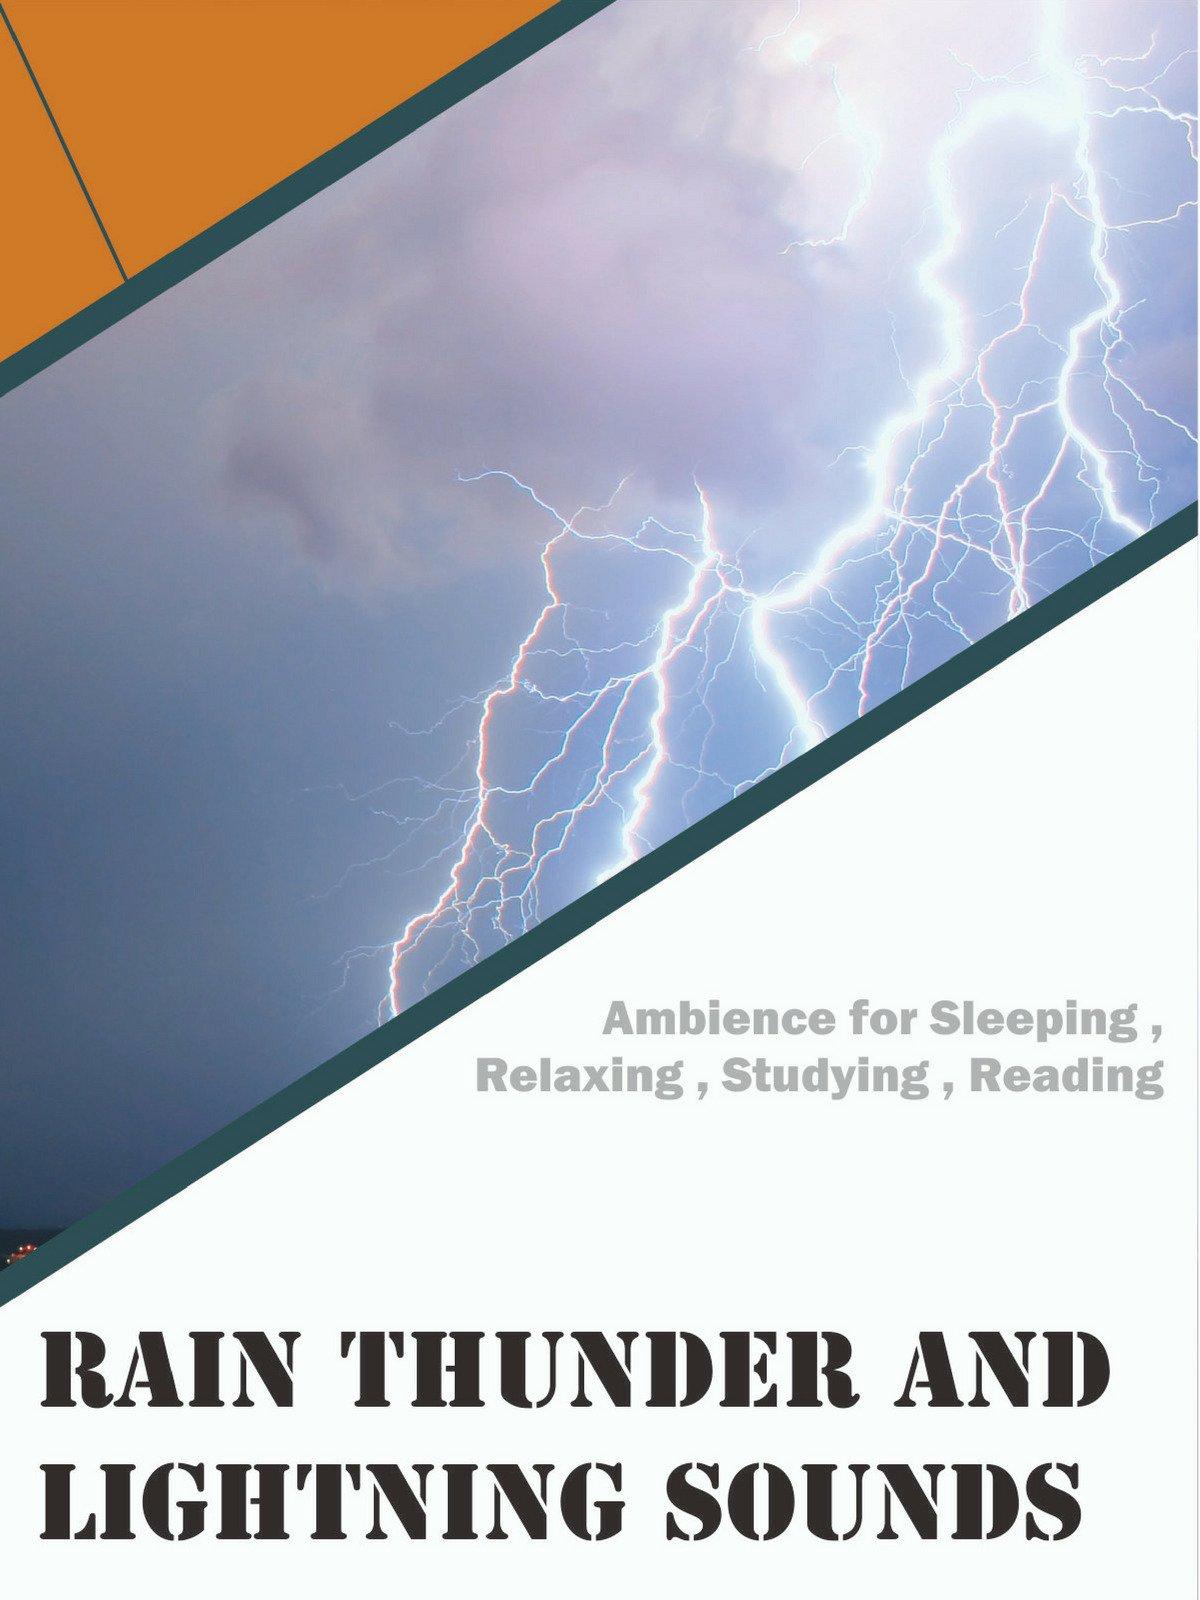 Rain Thunder and Lightning Sounds